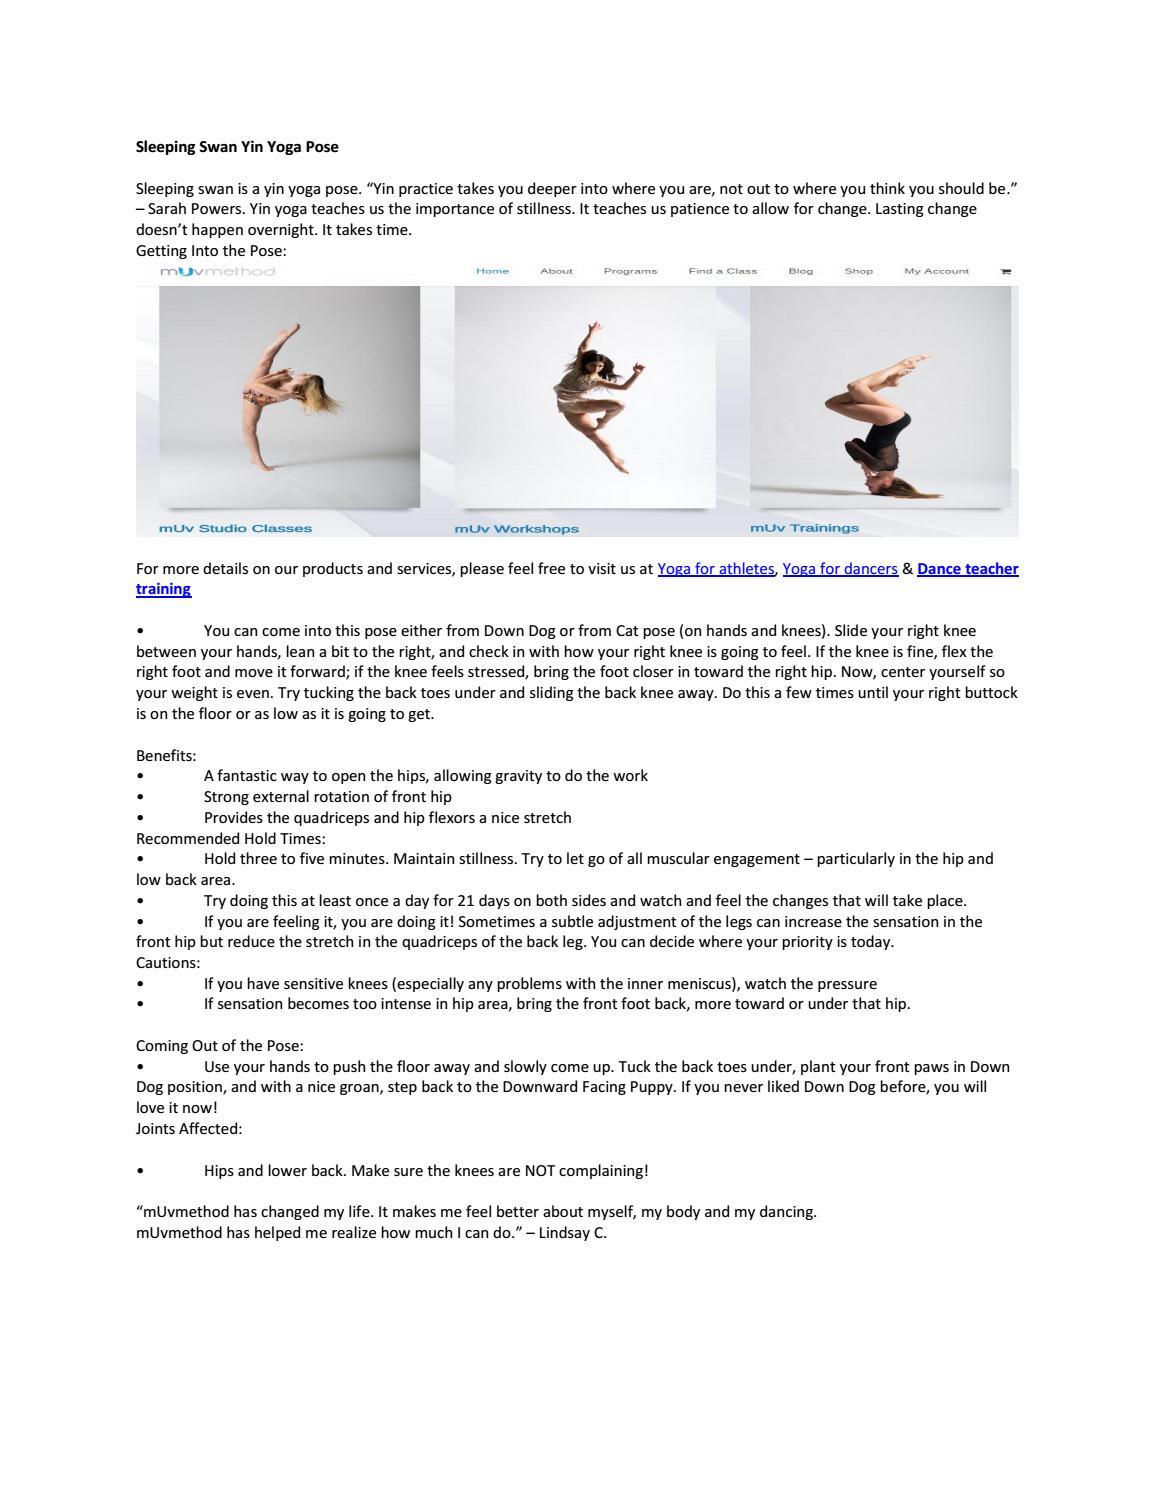 Sleeping Swan Yin Yoga Pose By MUvmethod